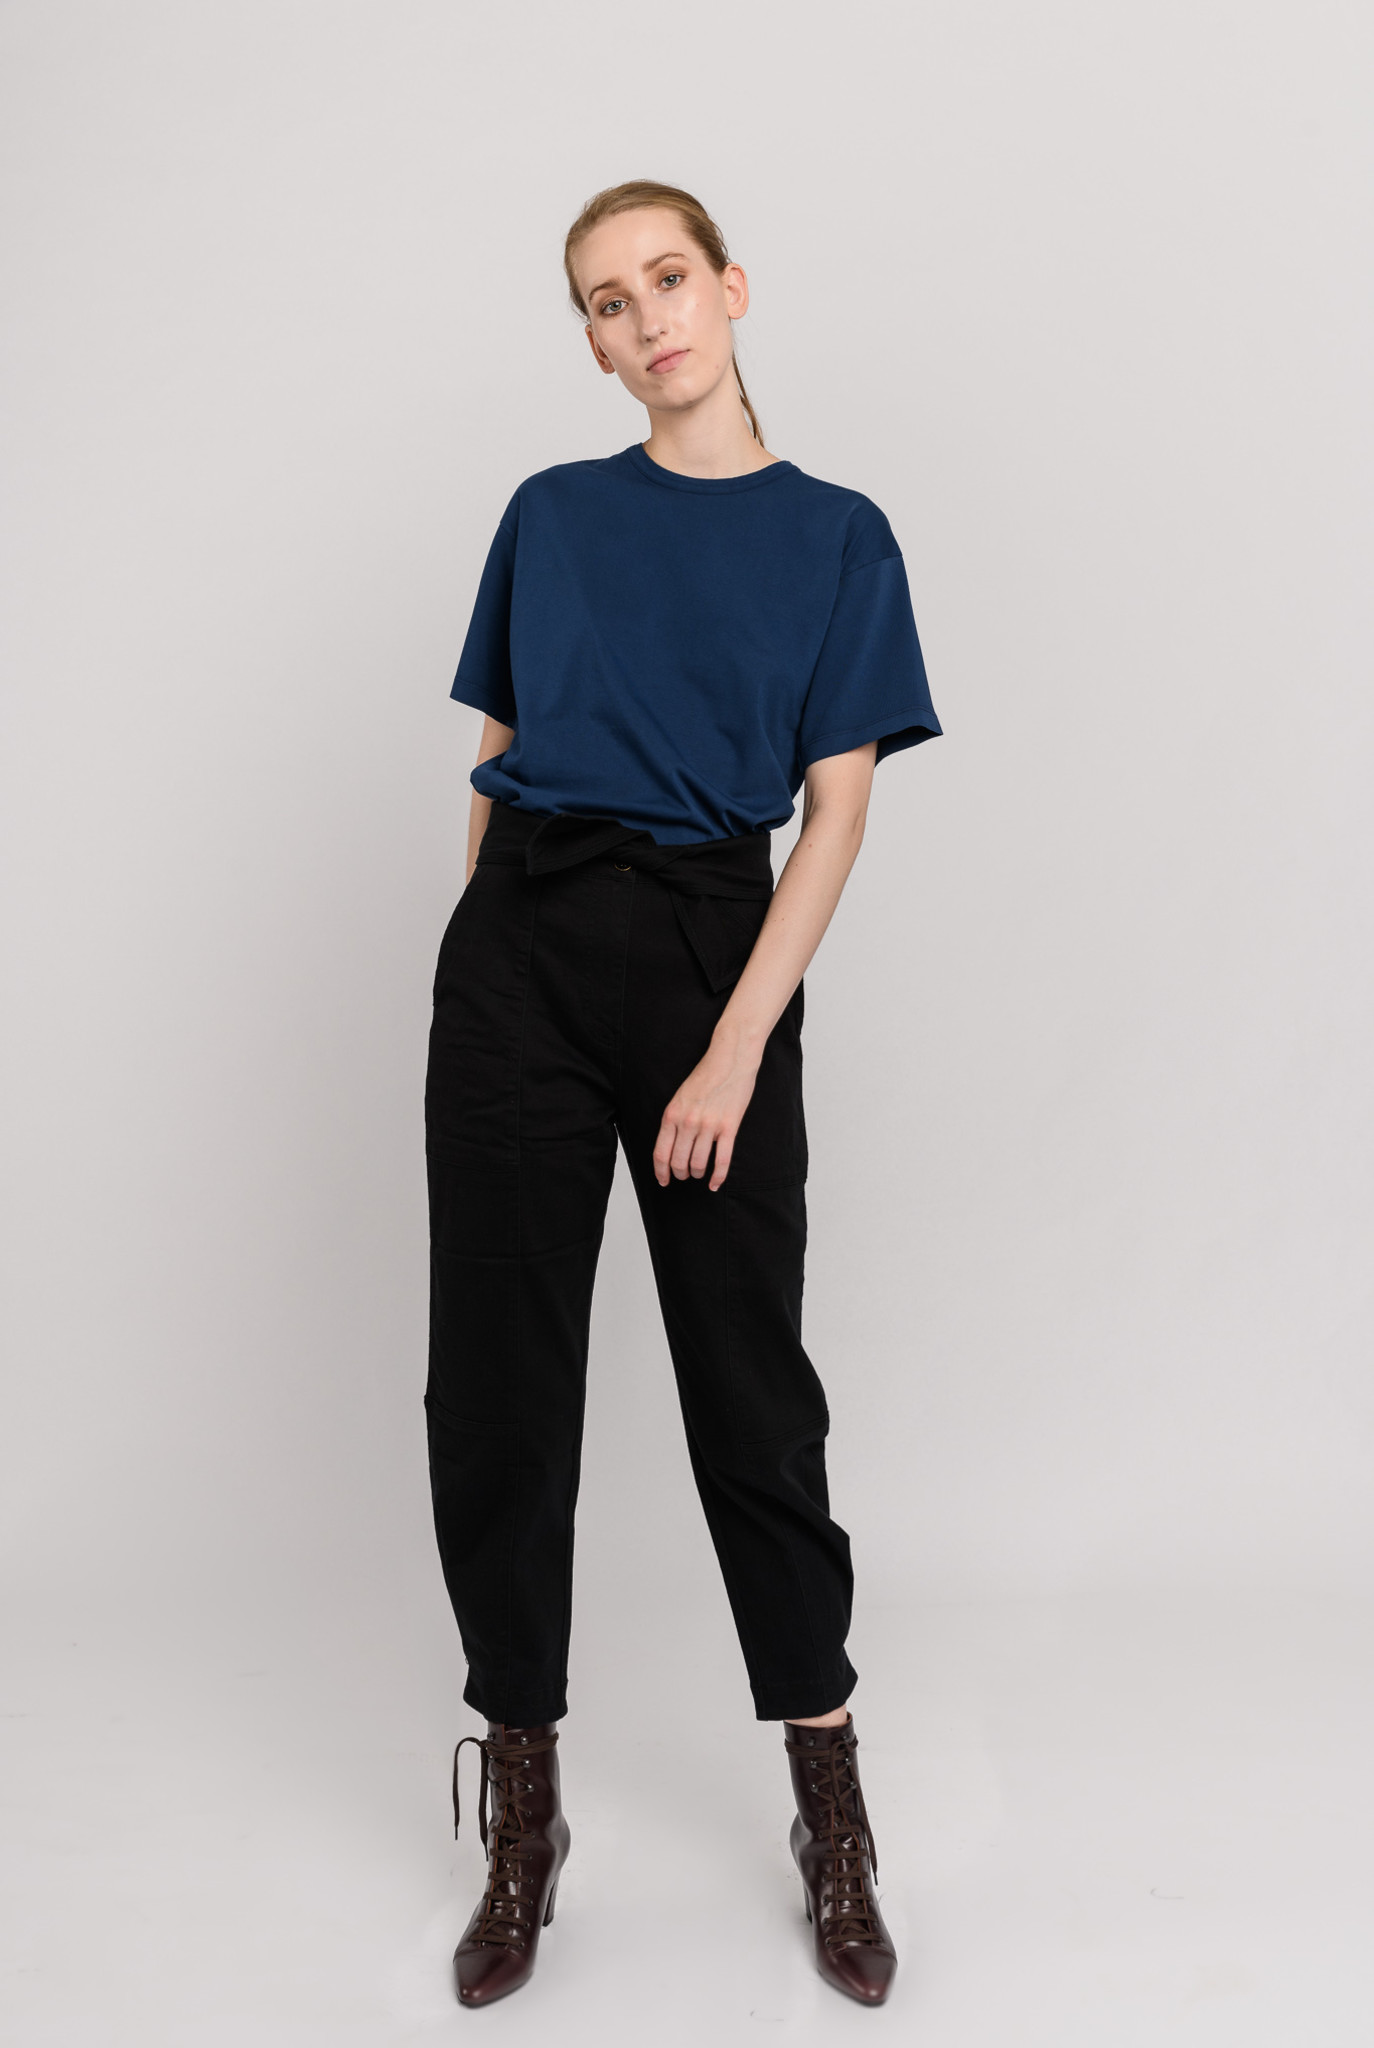 Unisex t-shirt S/S Navy Peony